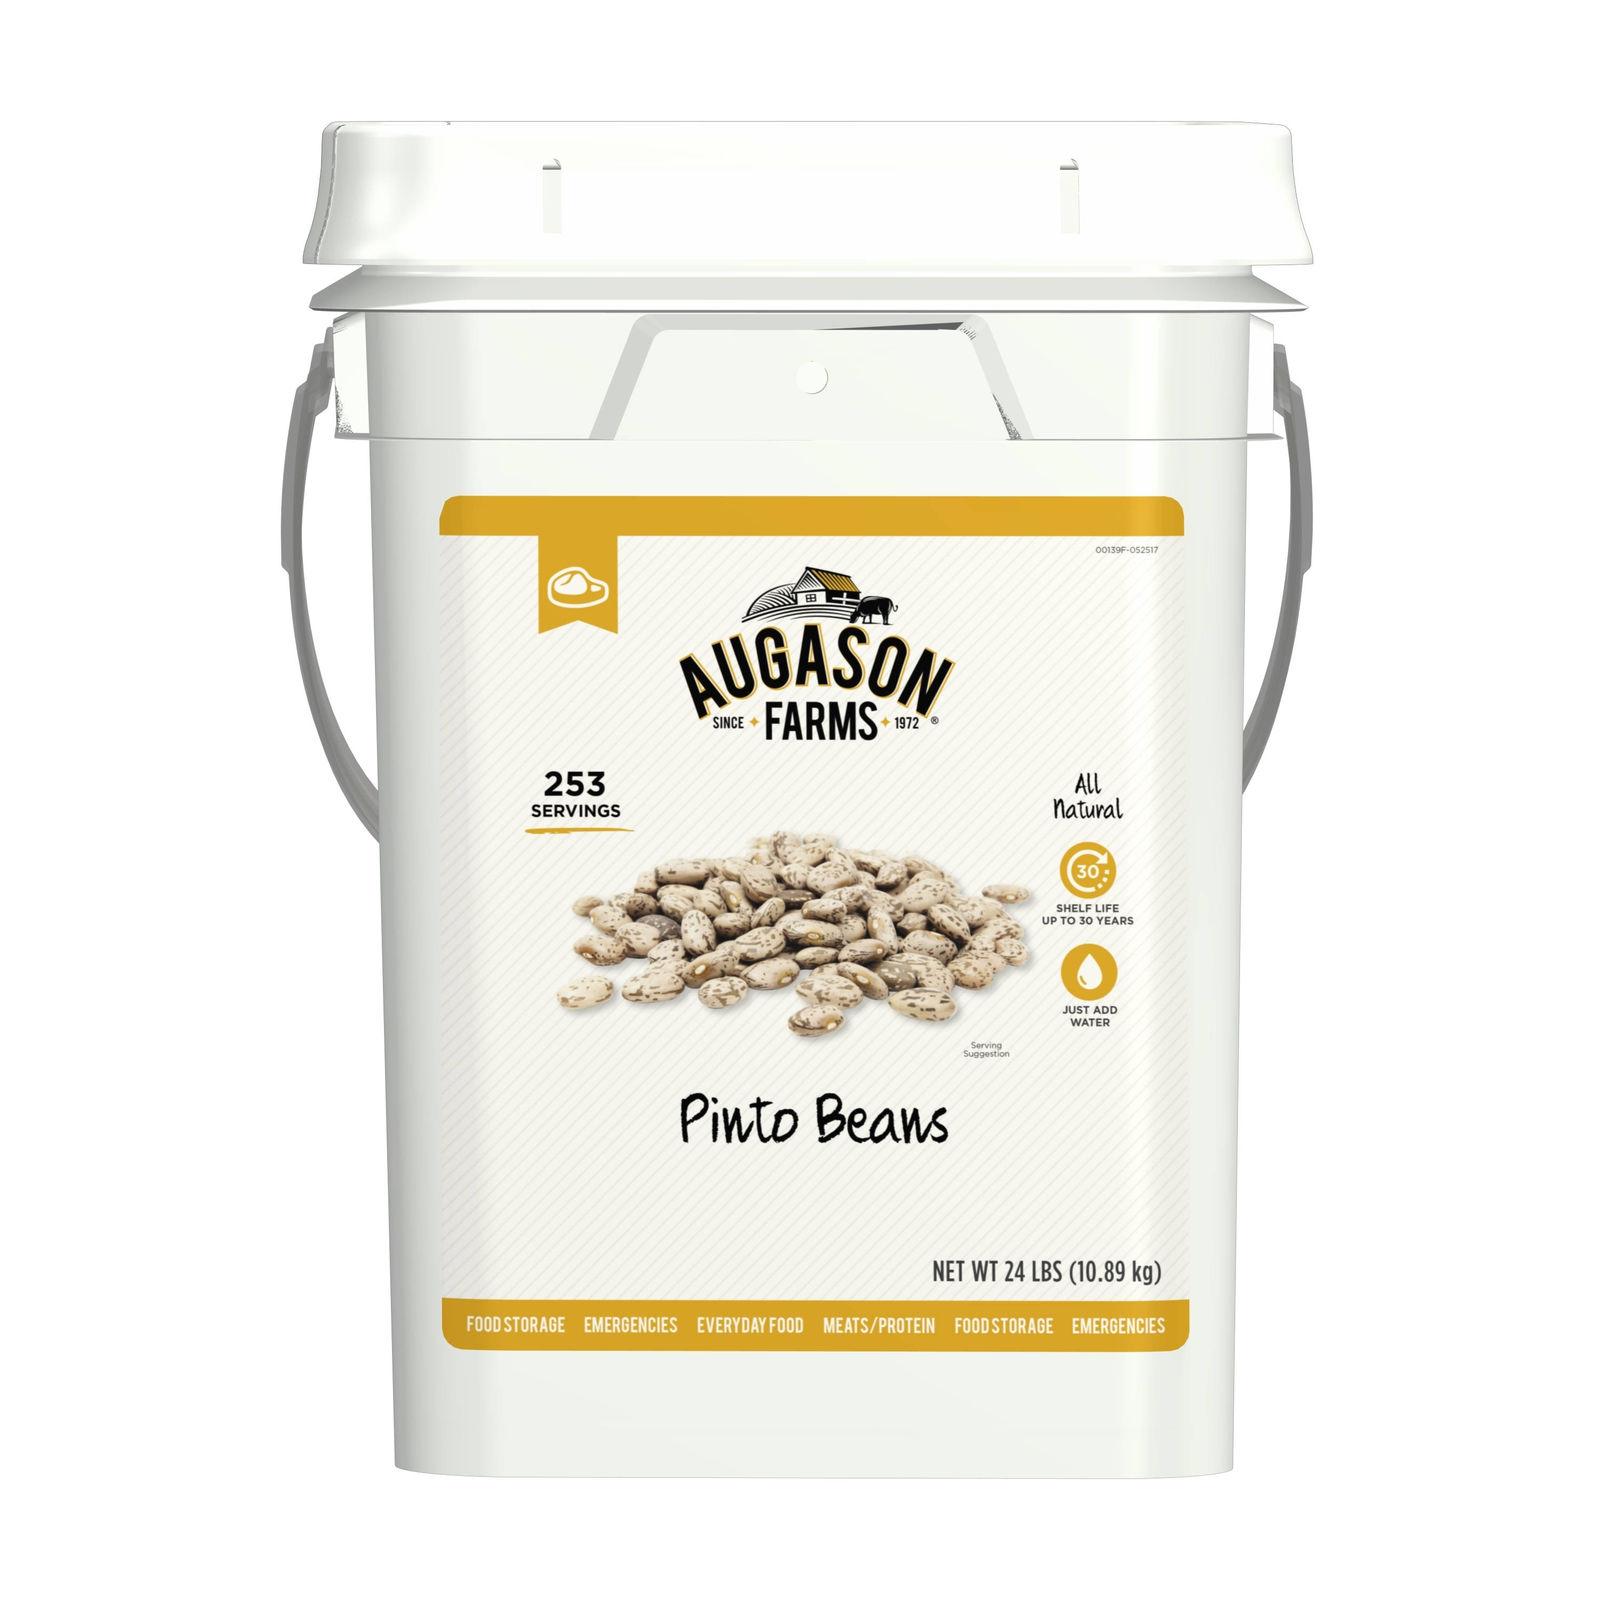 Augason Farms Pinto Beans Emergency Bulk Food Storage 24 Pound 4 Gallon Pail 253 1